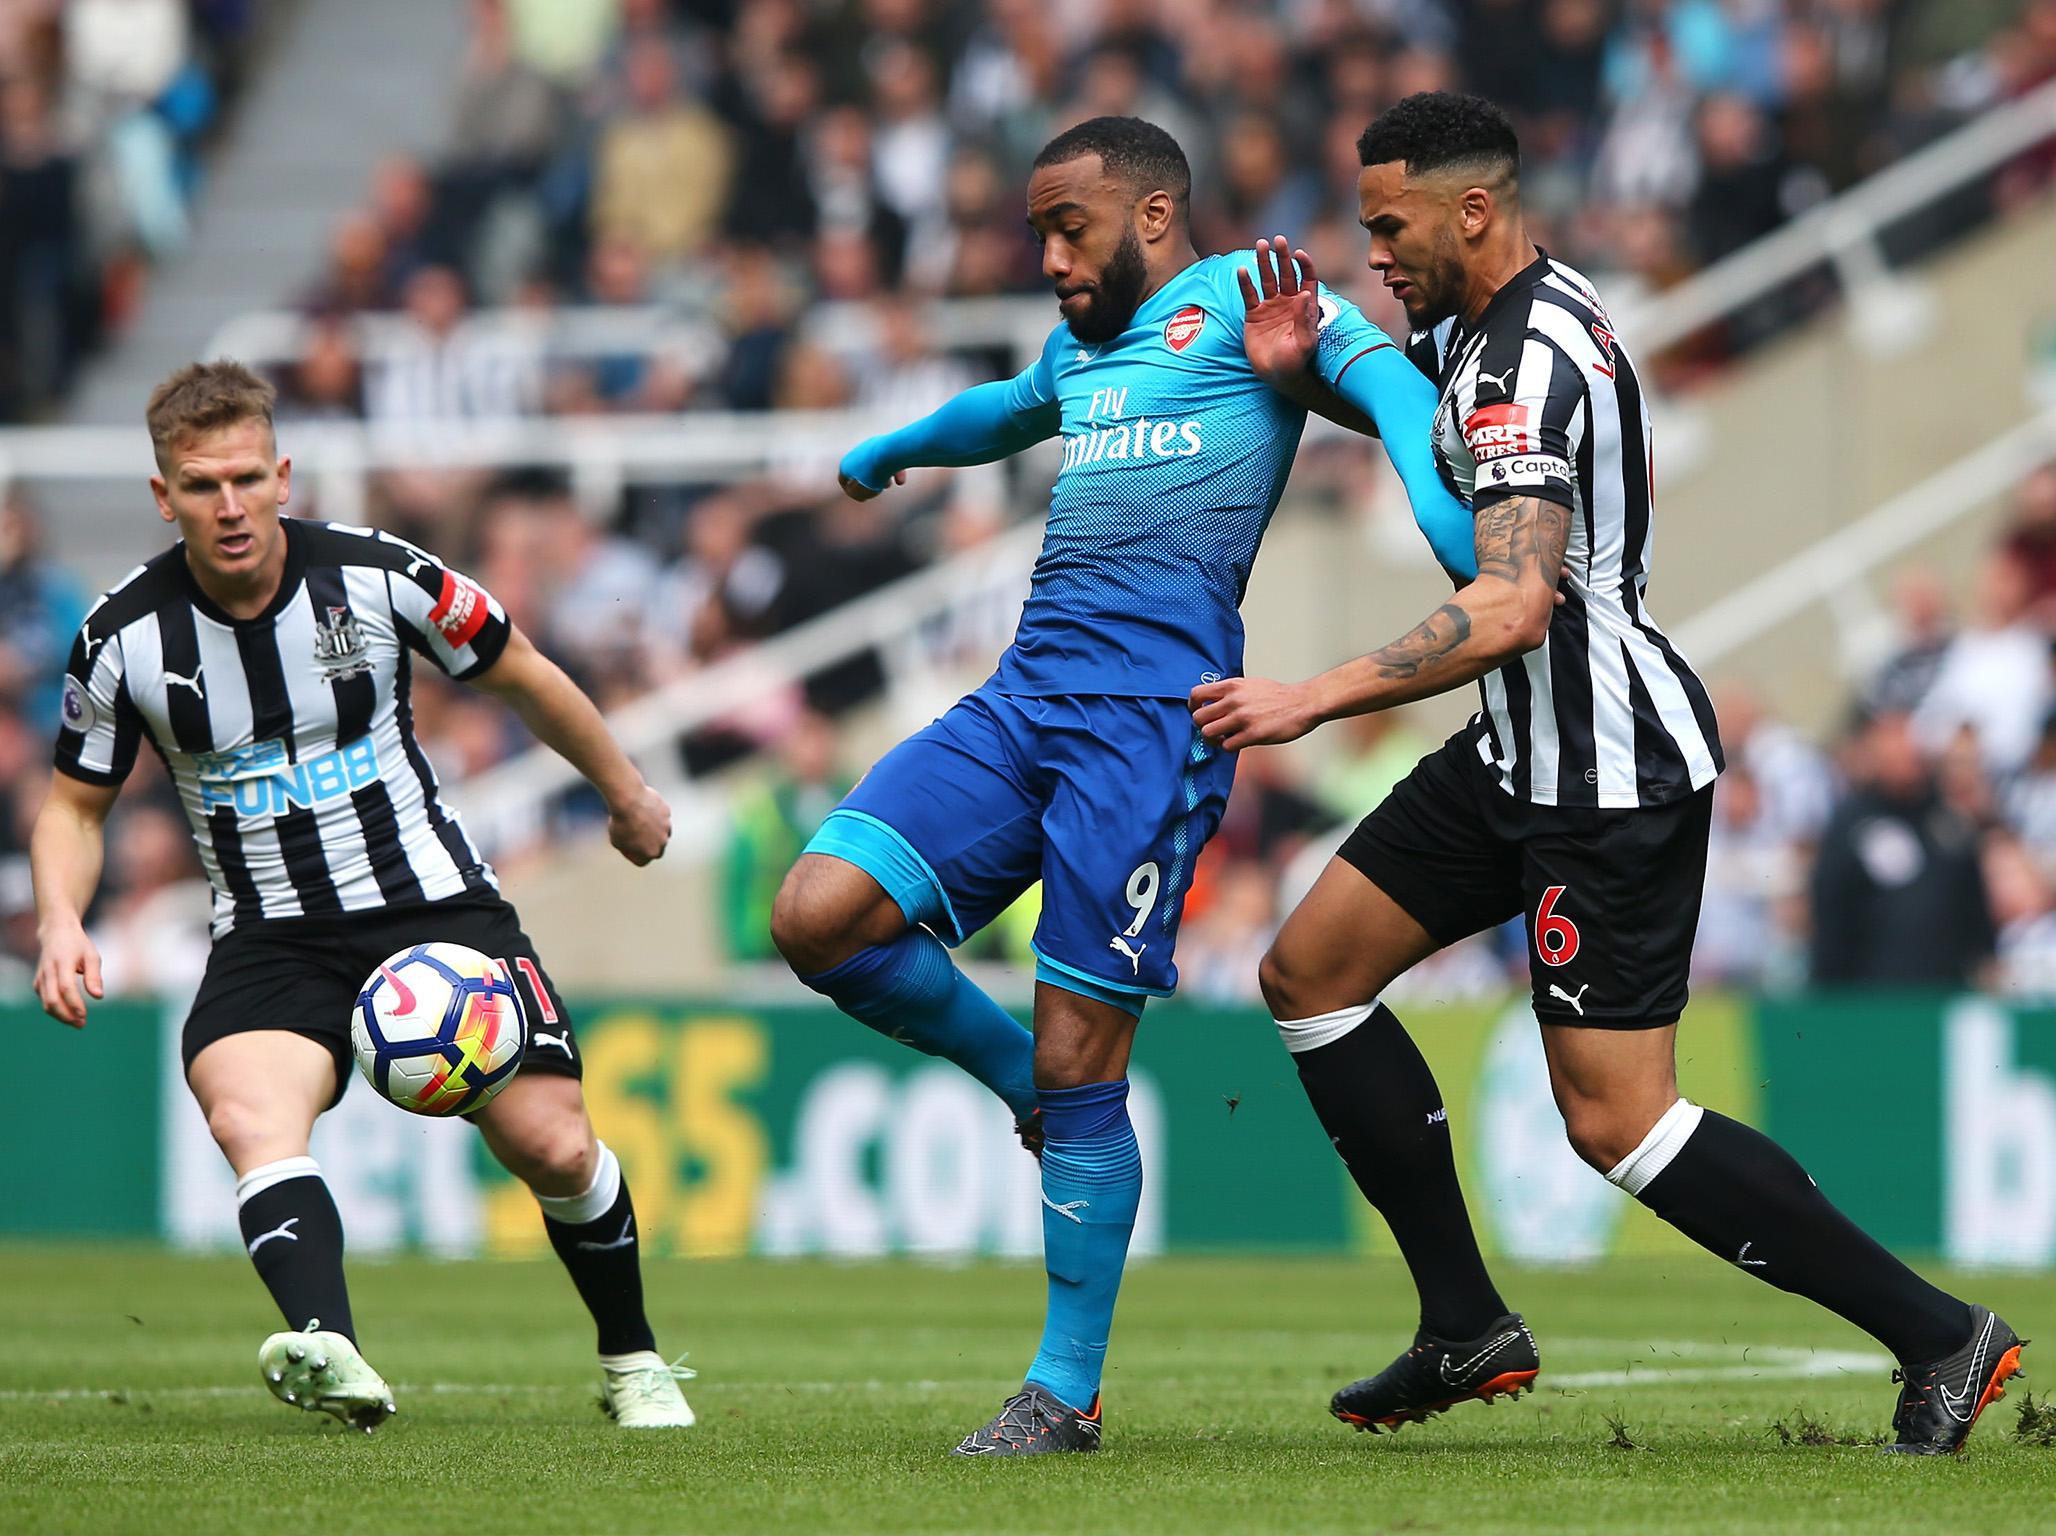 Newcastle United vs Arsenal LIVE: Premier League latest updates